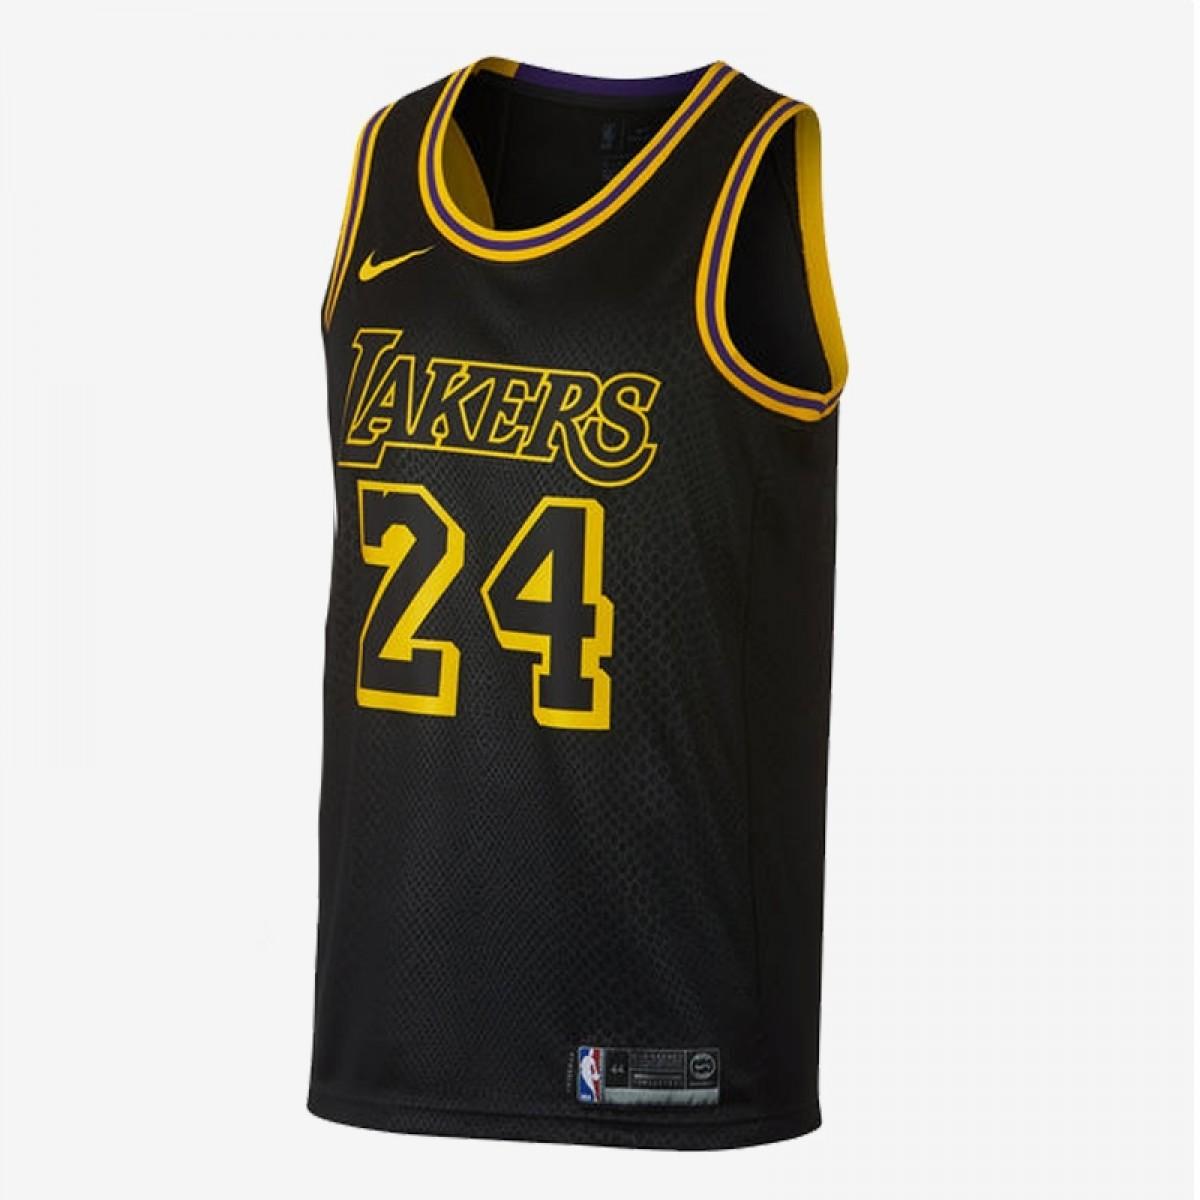 Nike Junior NBA Lakers Swingman Jersey Kobe Bryant 'City Edition'